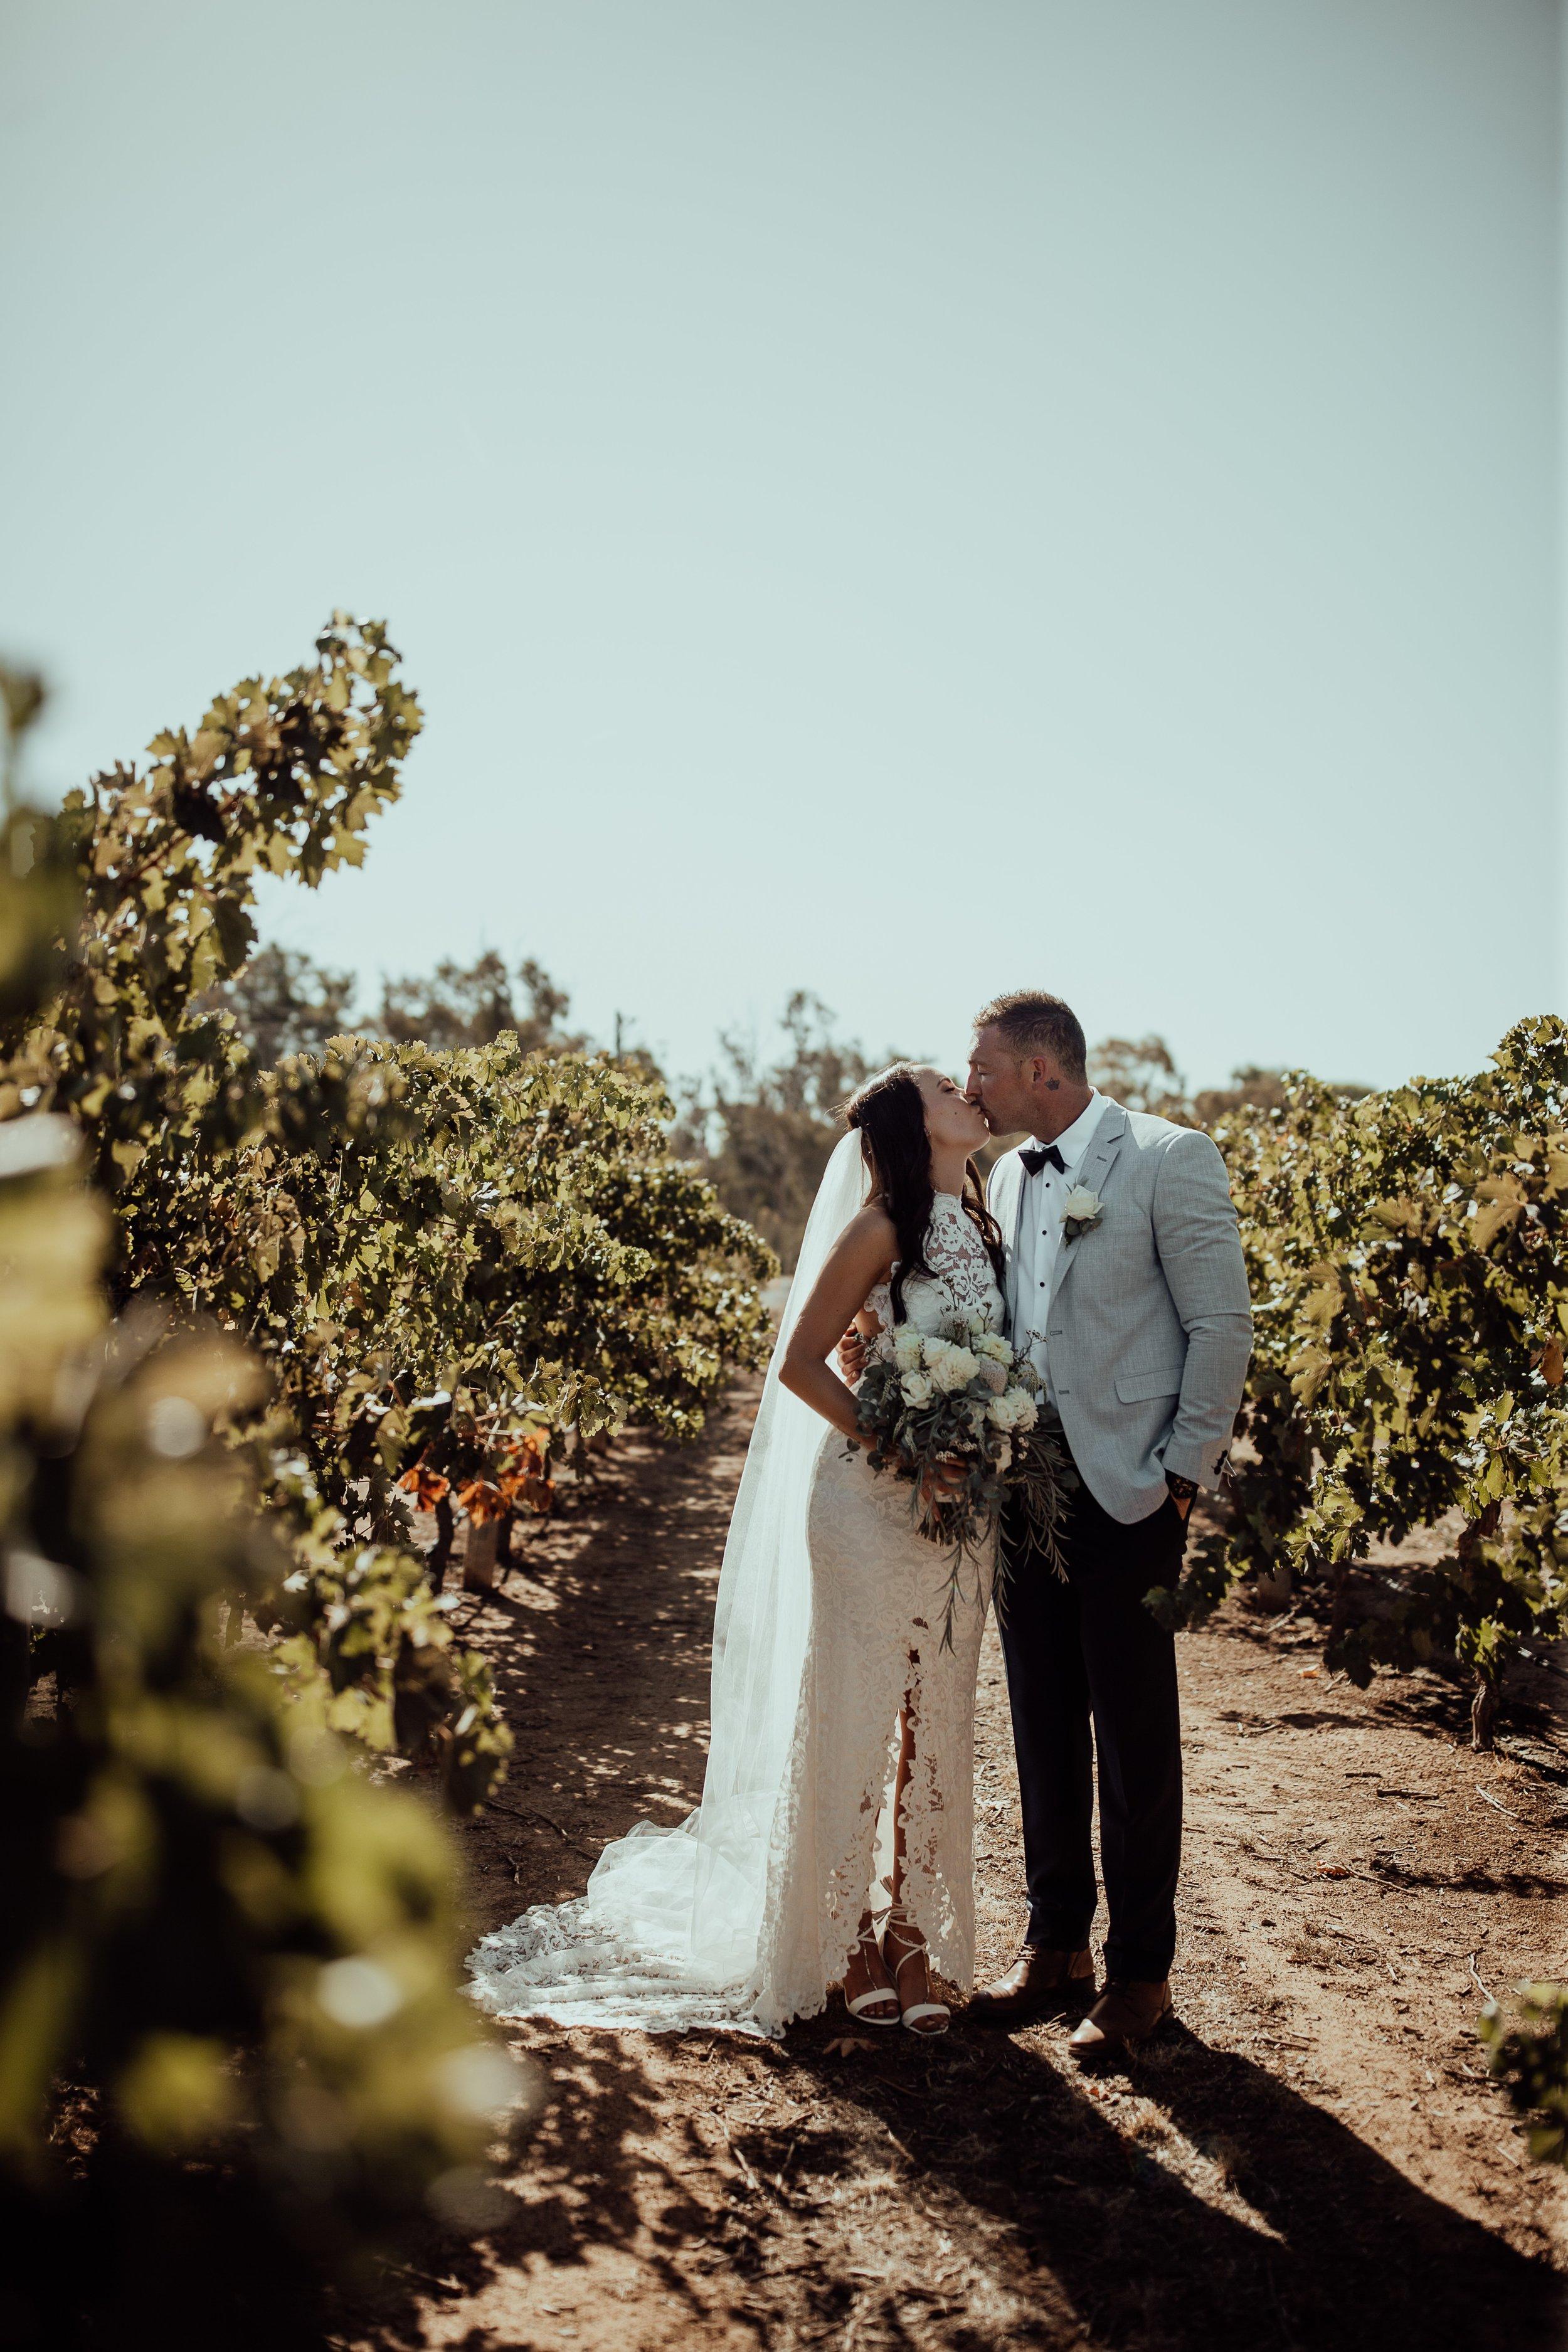 mickalathomas_puremacphotography_weddingphotographer_couplephotographer_Sheppartonphotographer_1479.jpg